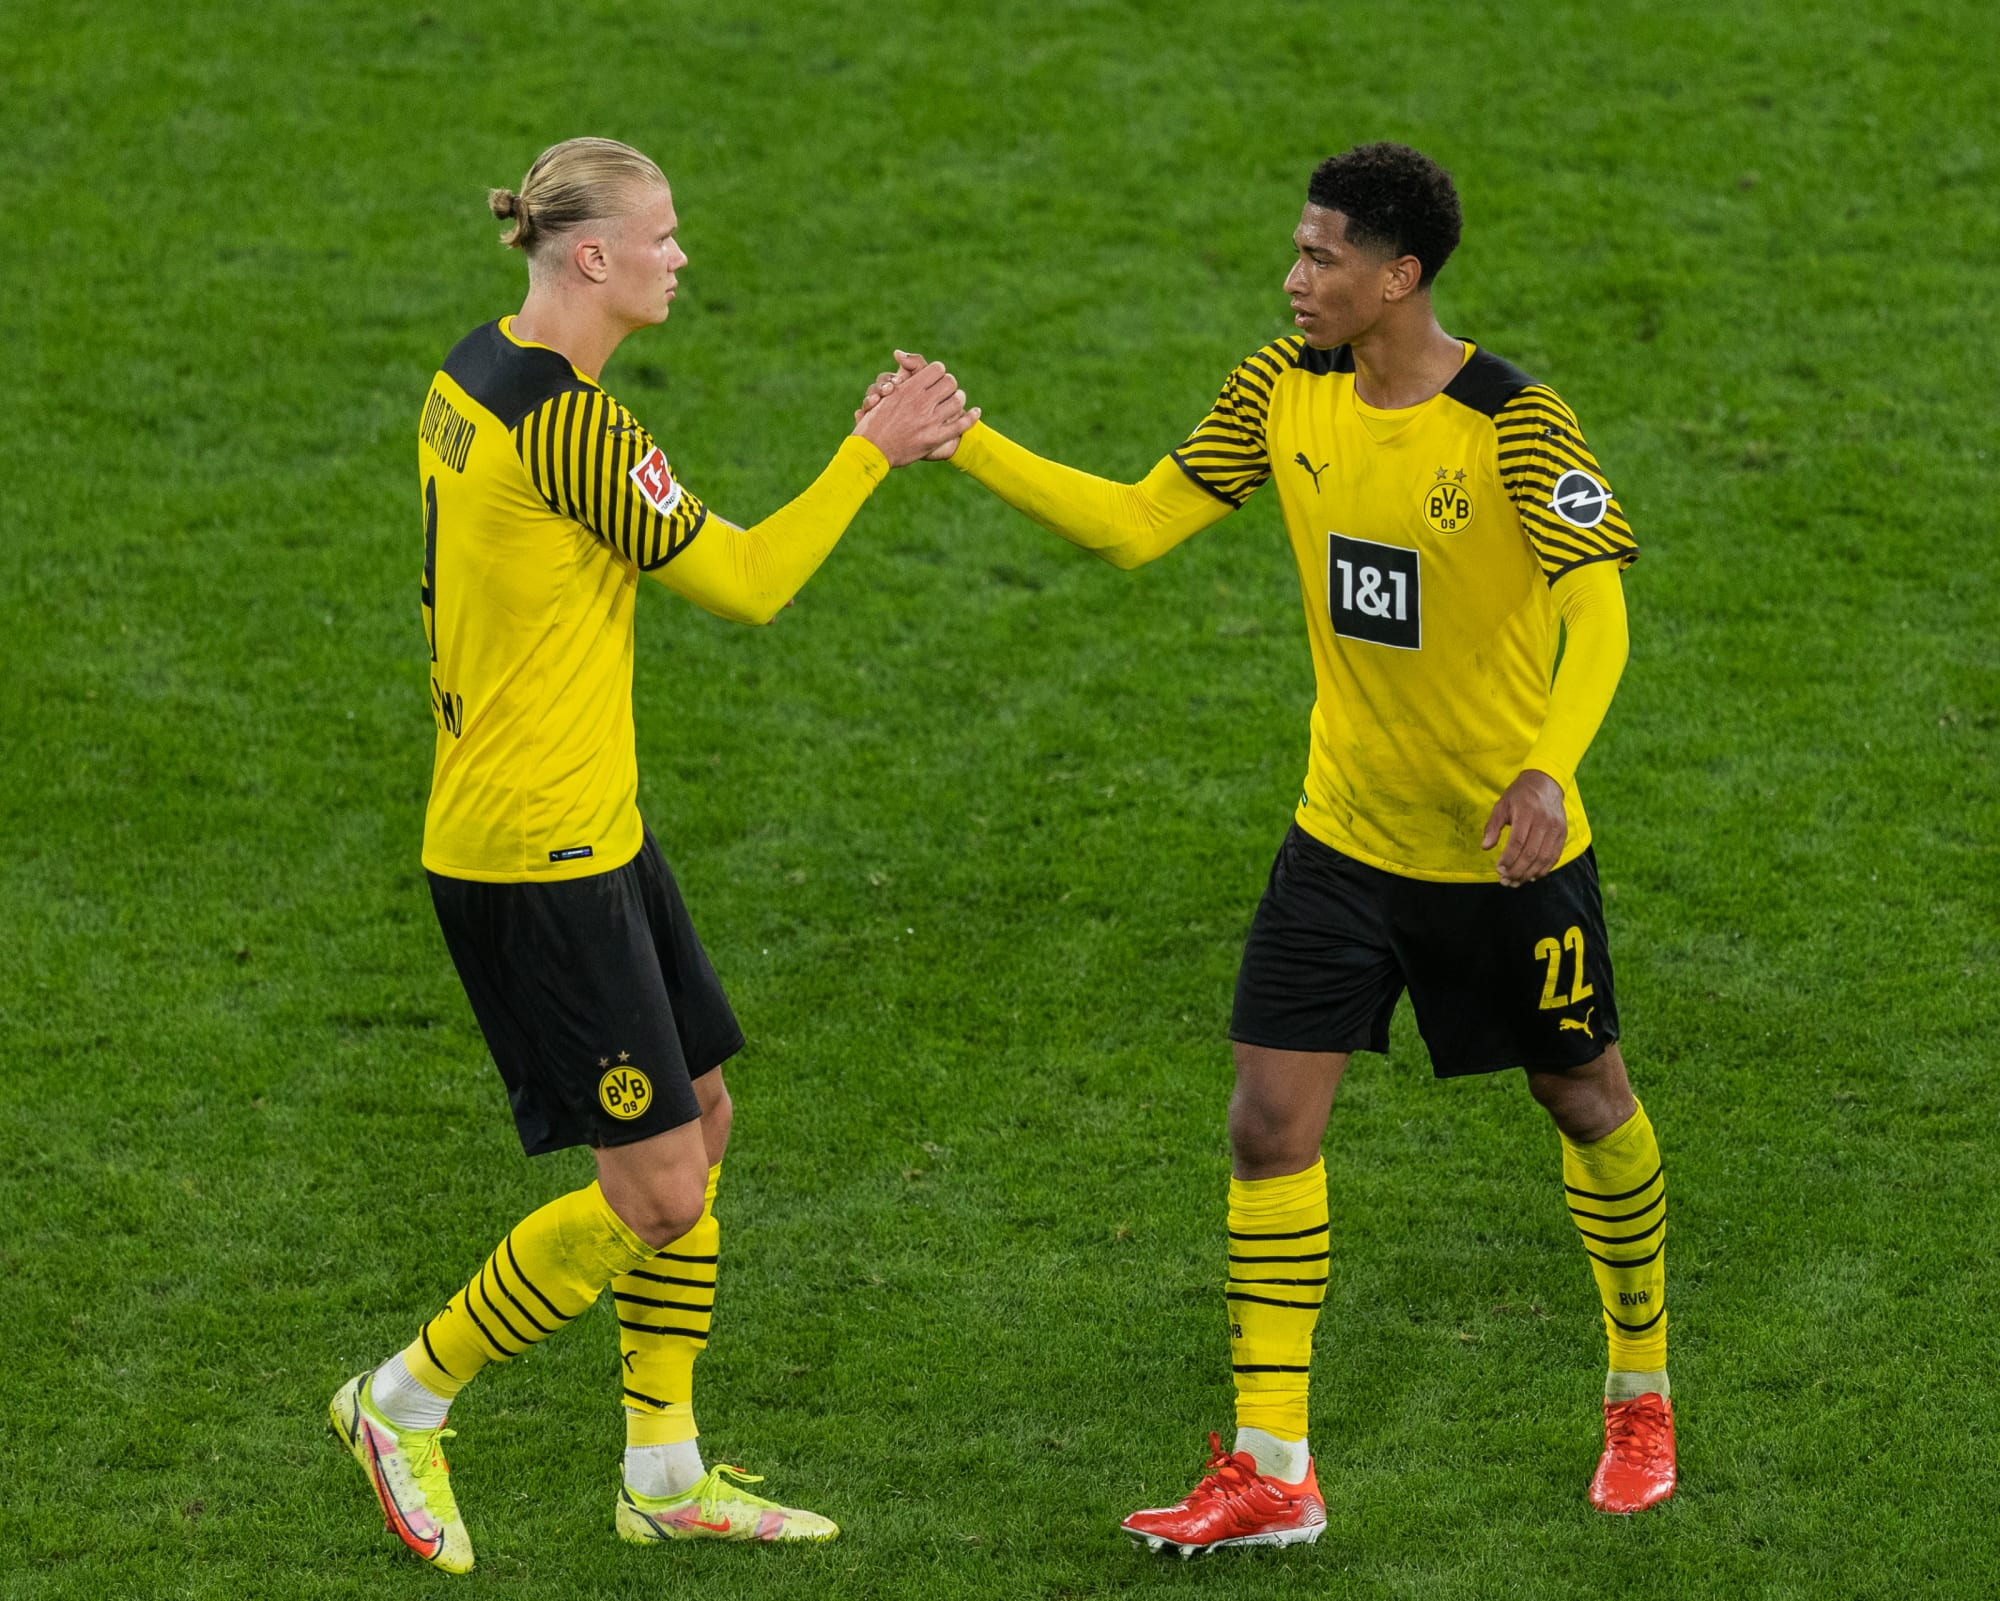 Watch Bayer Leverkusen vs Borussia Dortmund: Live stream, TV info